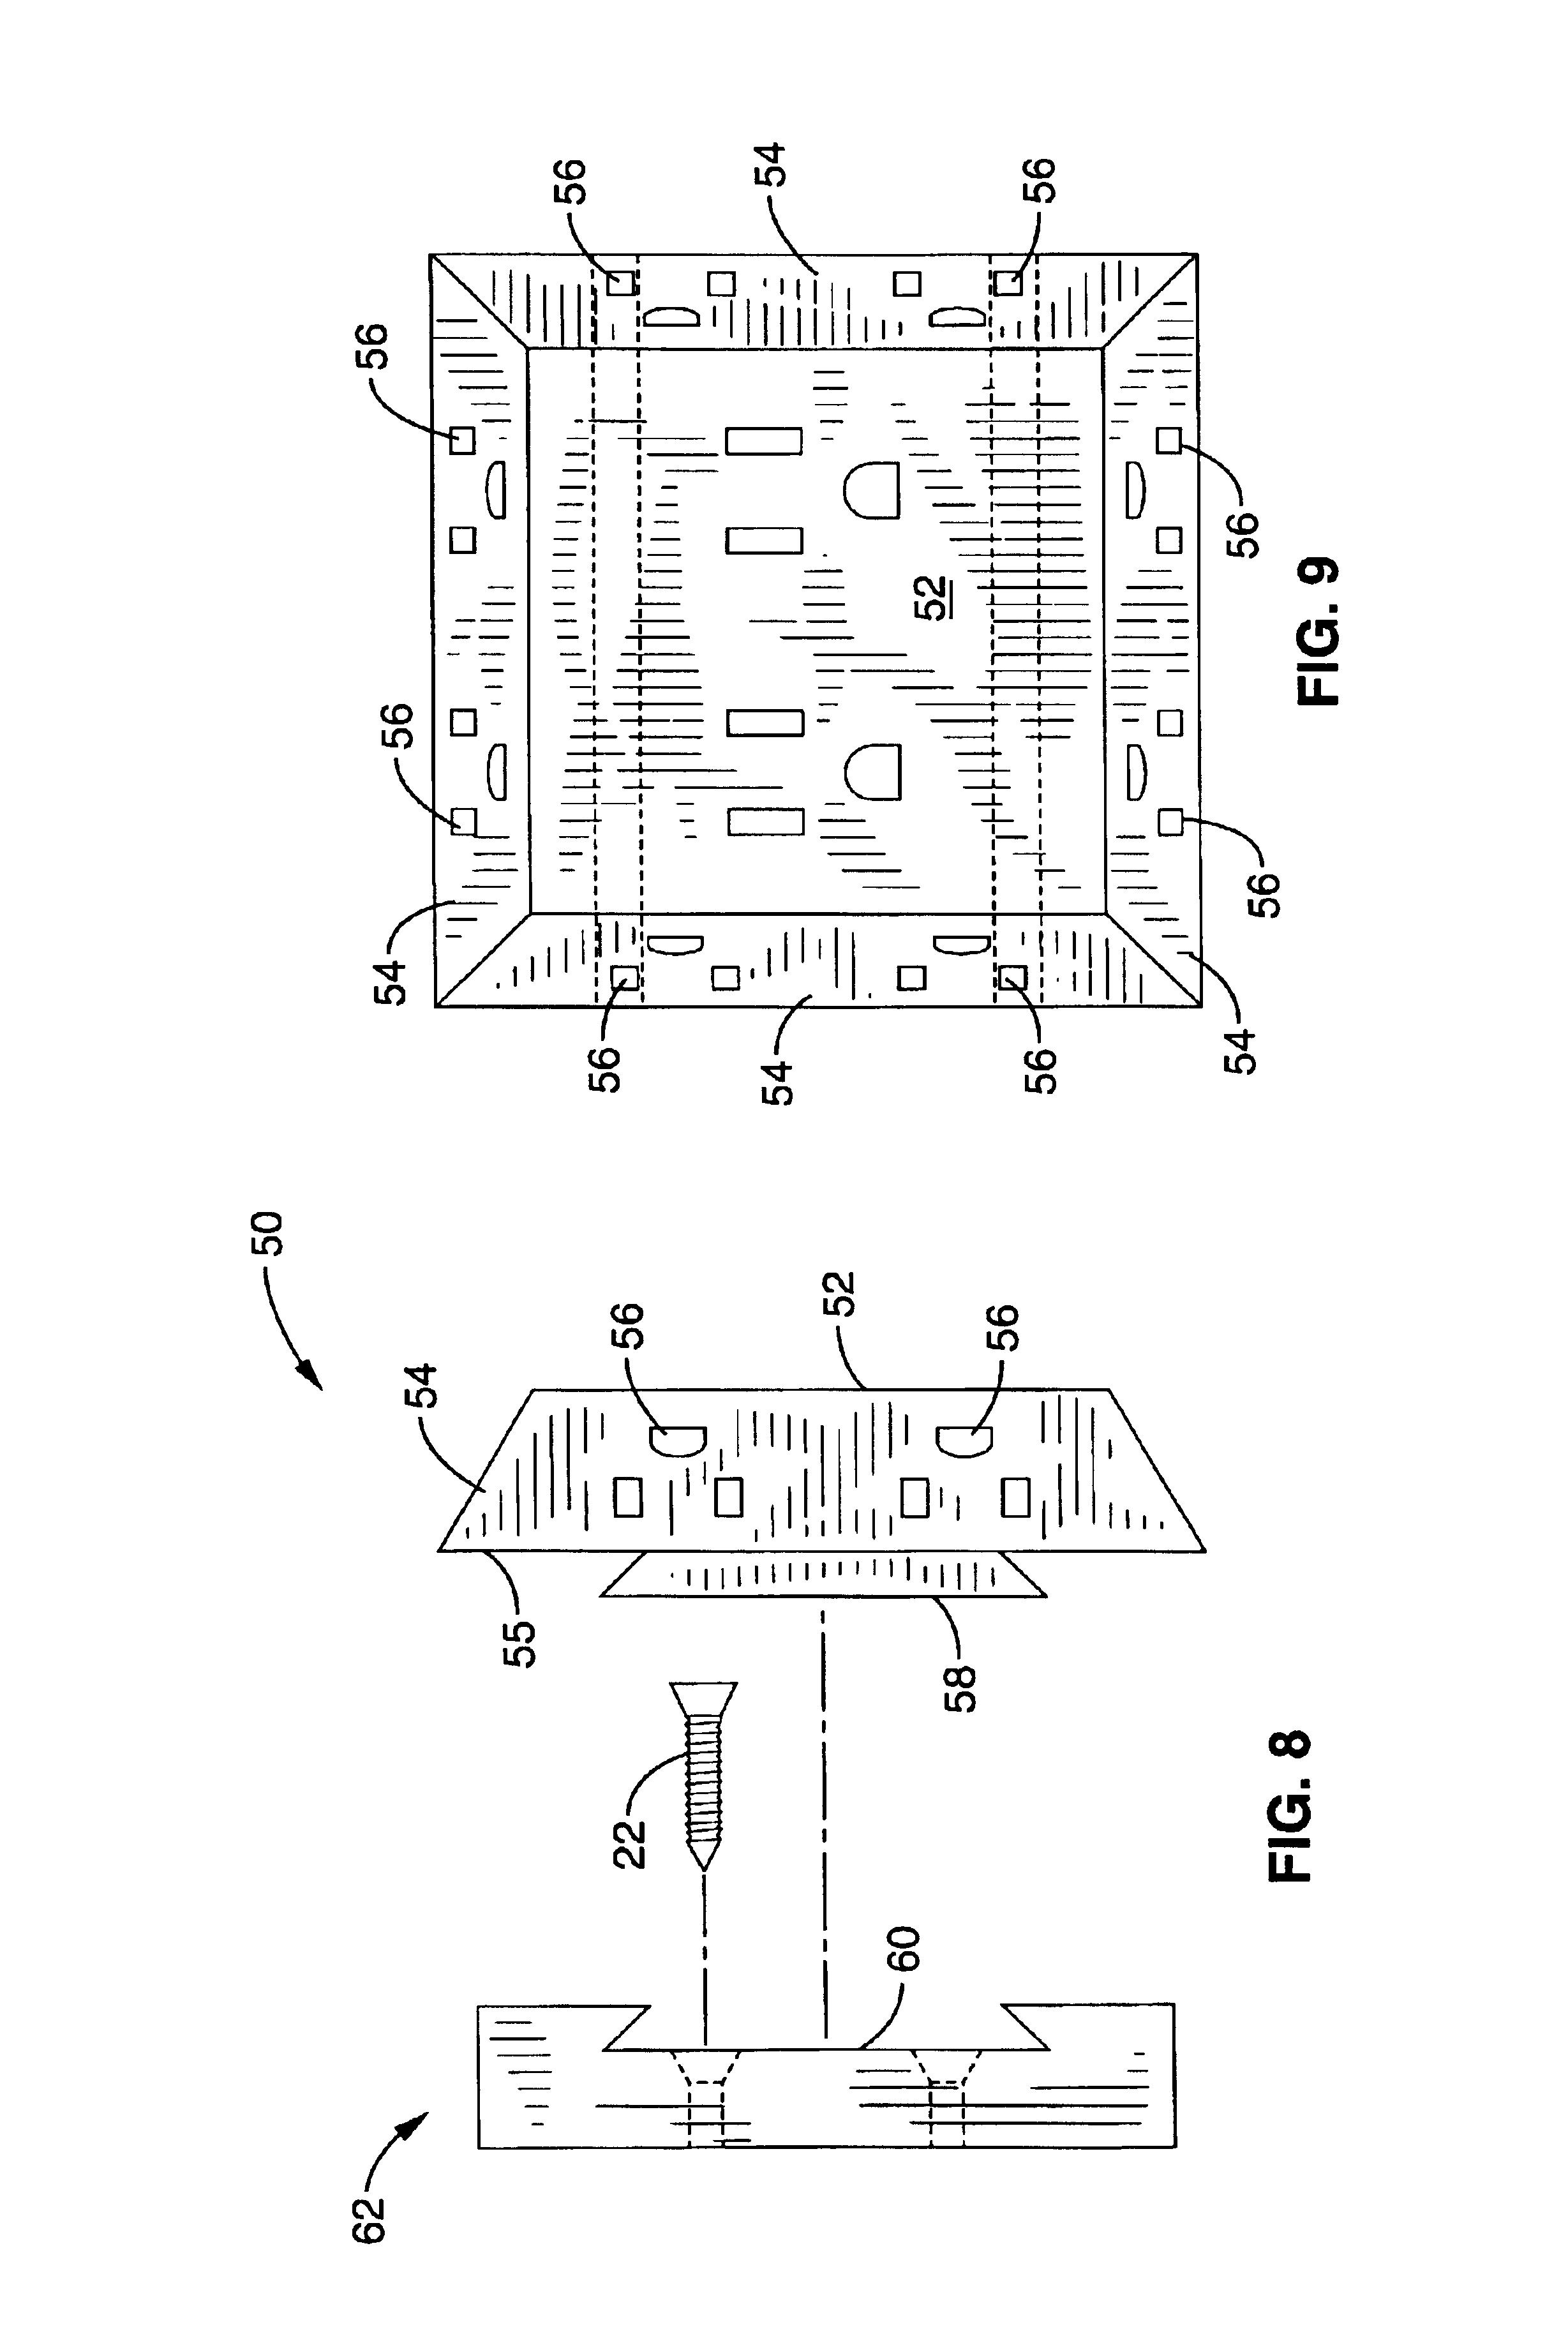 electrical female socket